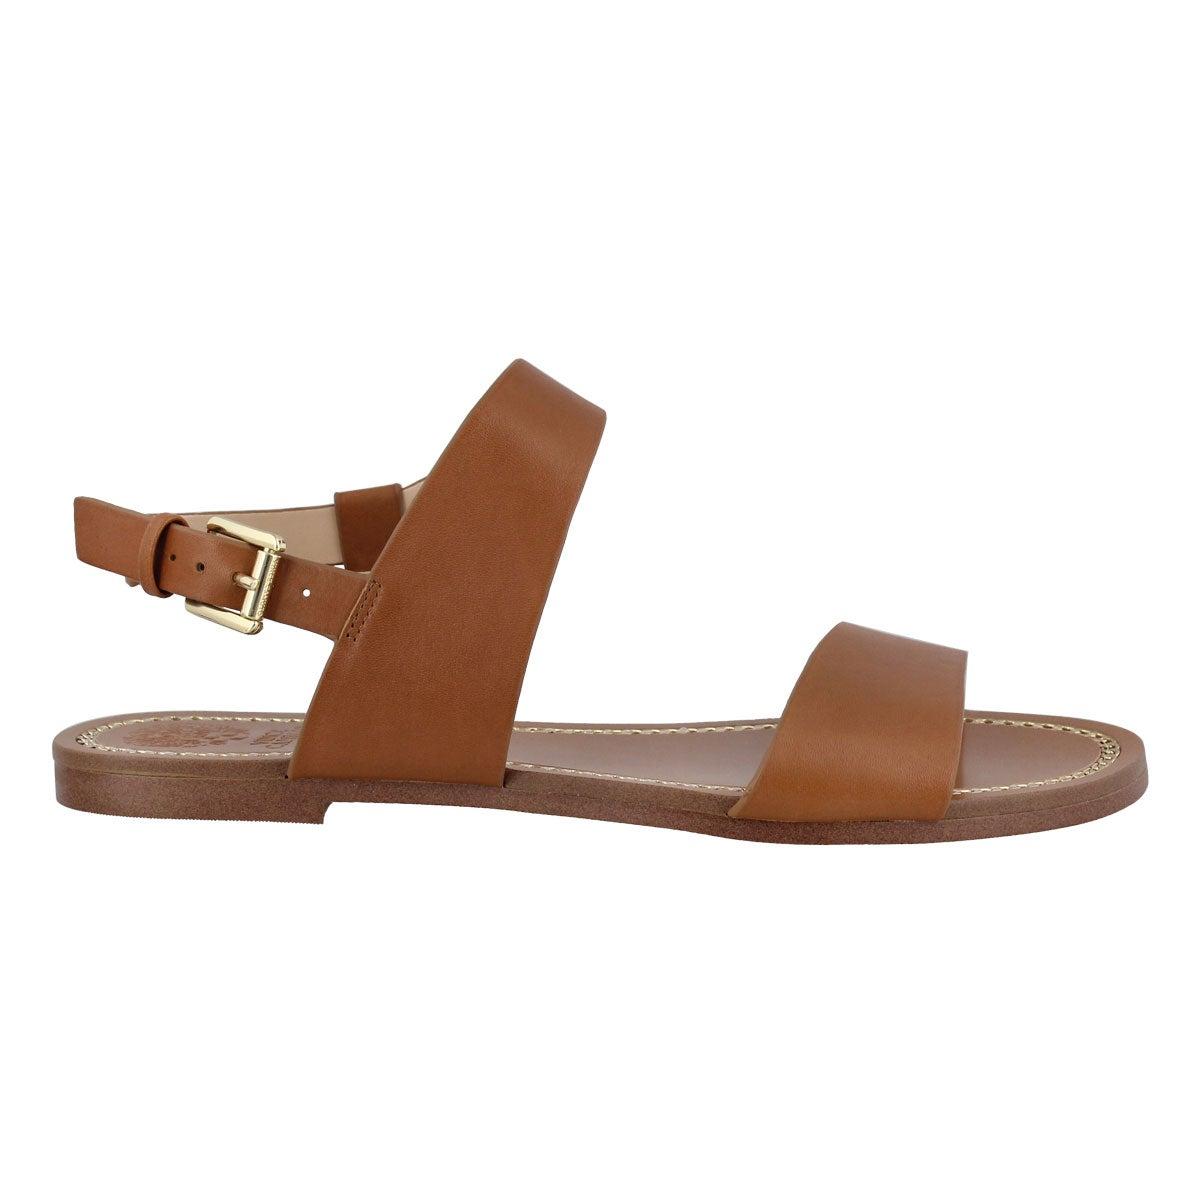 Lds Rentin whiskey barrel dress sandal